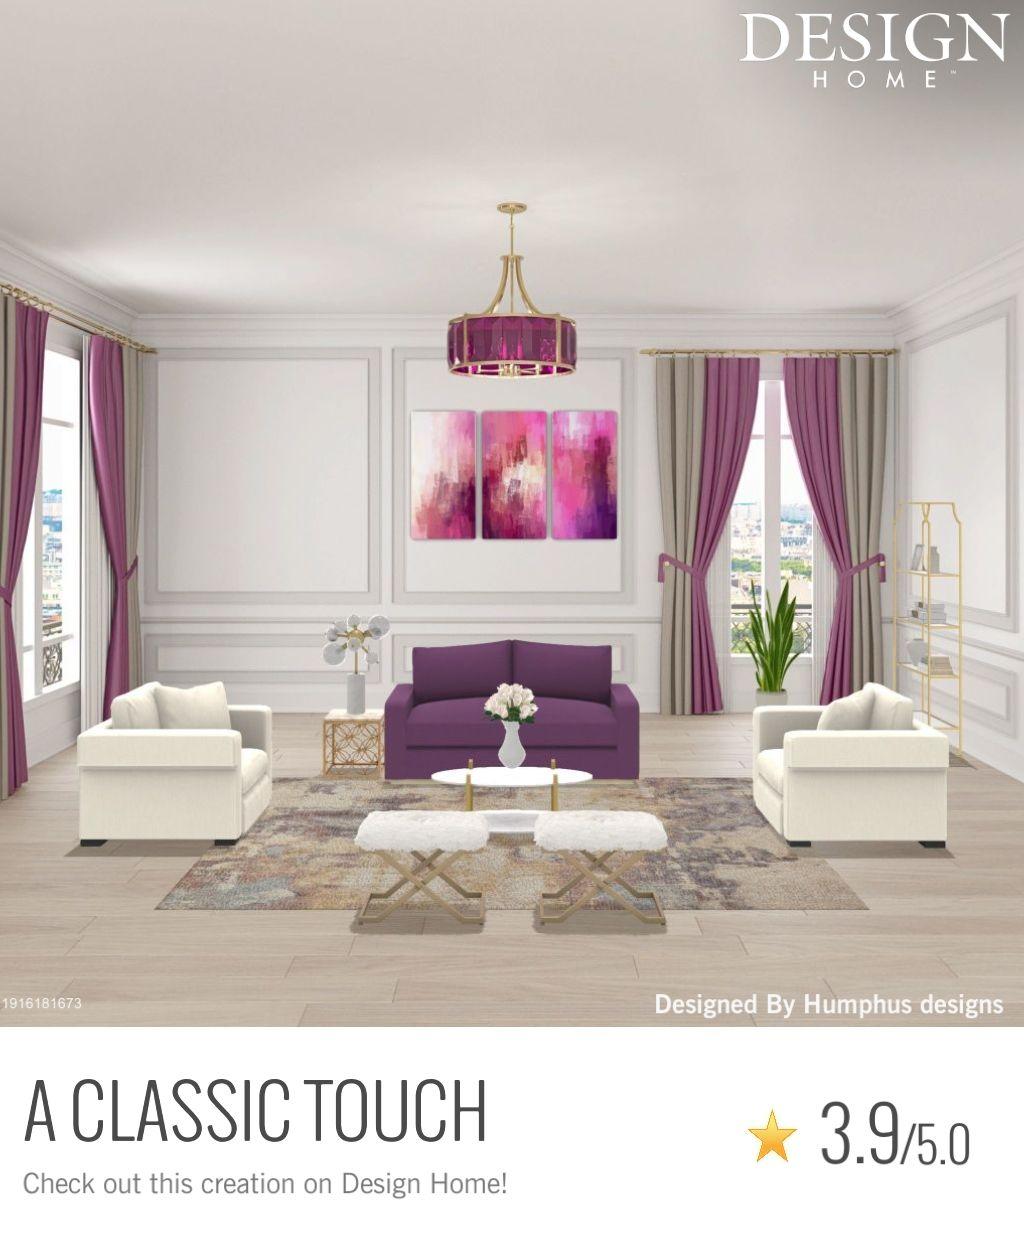 Pin By Randi Jo Humphus On My Home Designs 1 Design Home App My Home Design Design